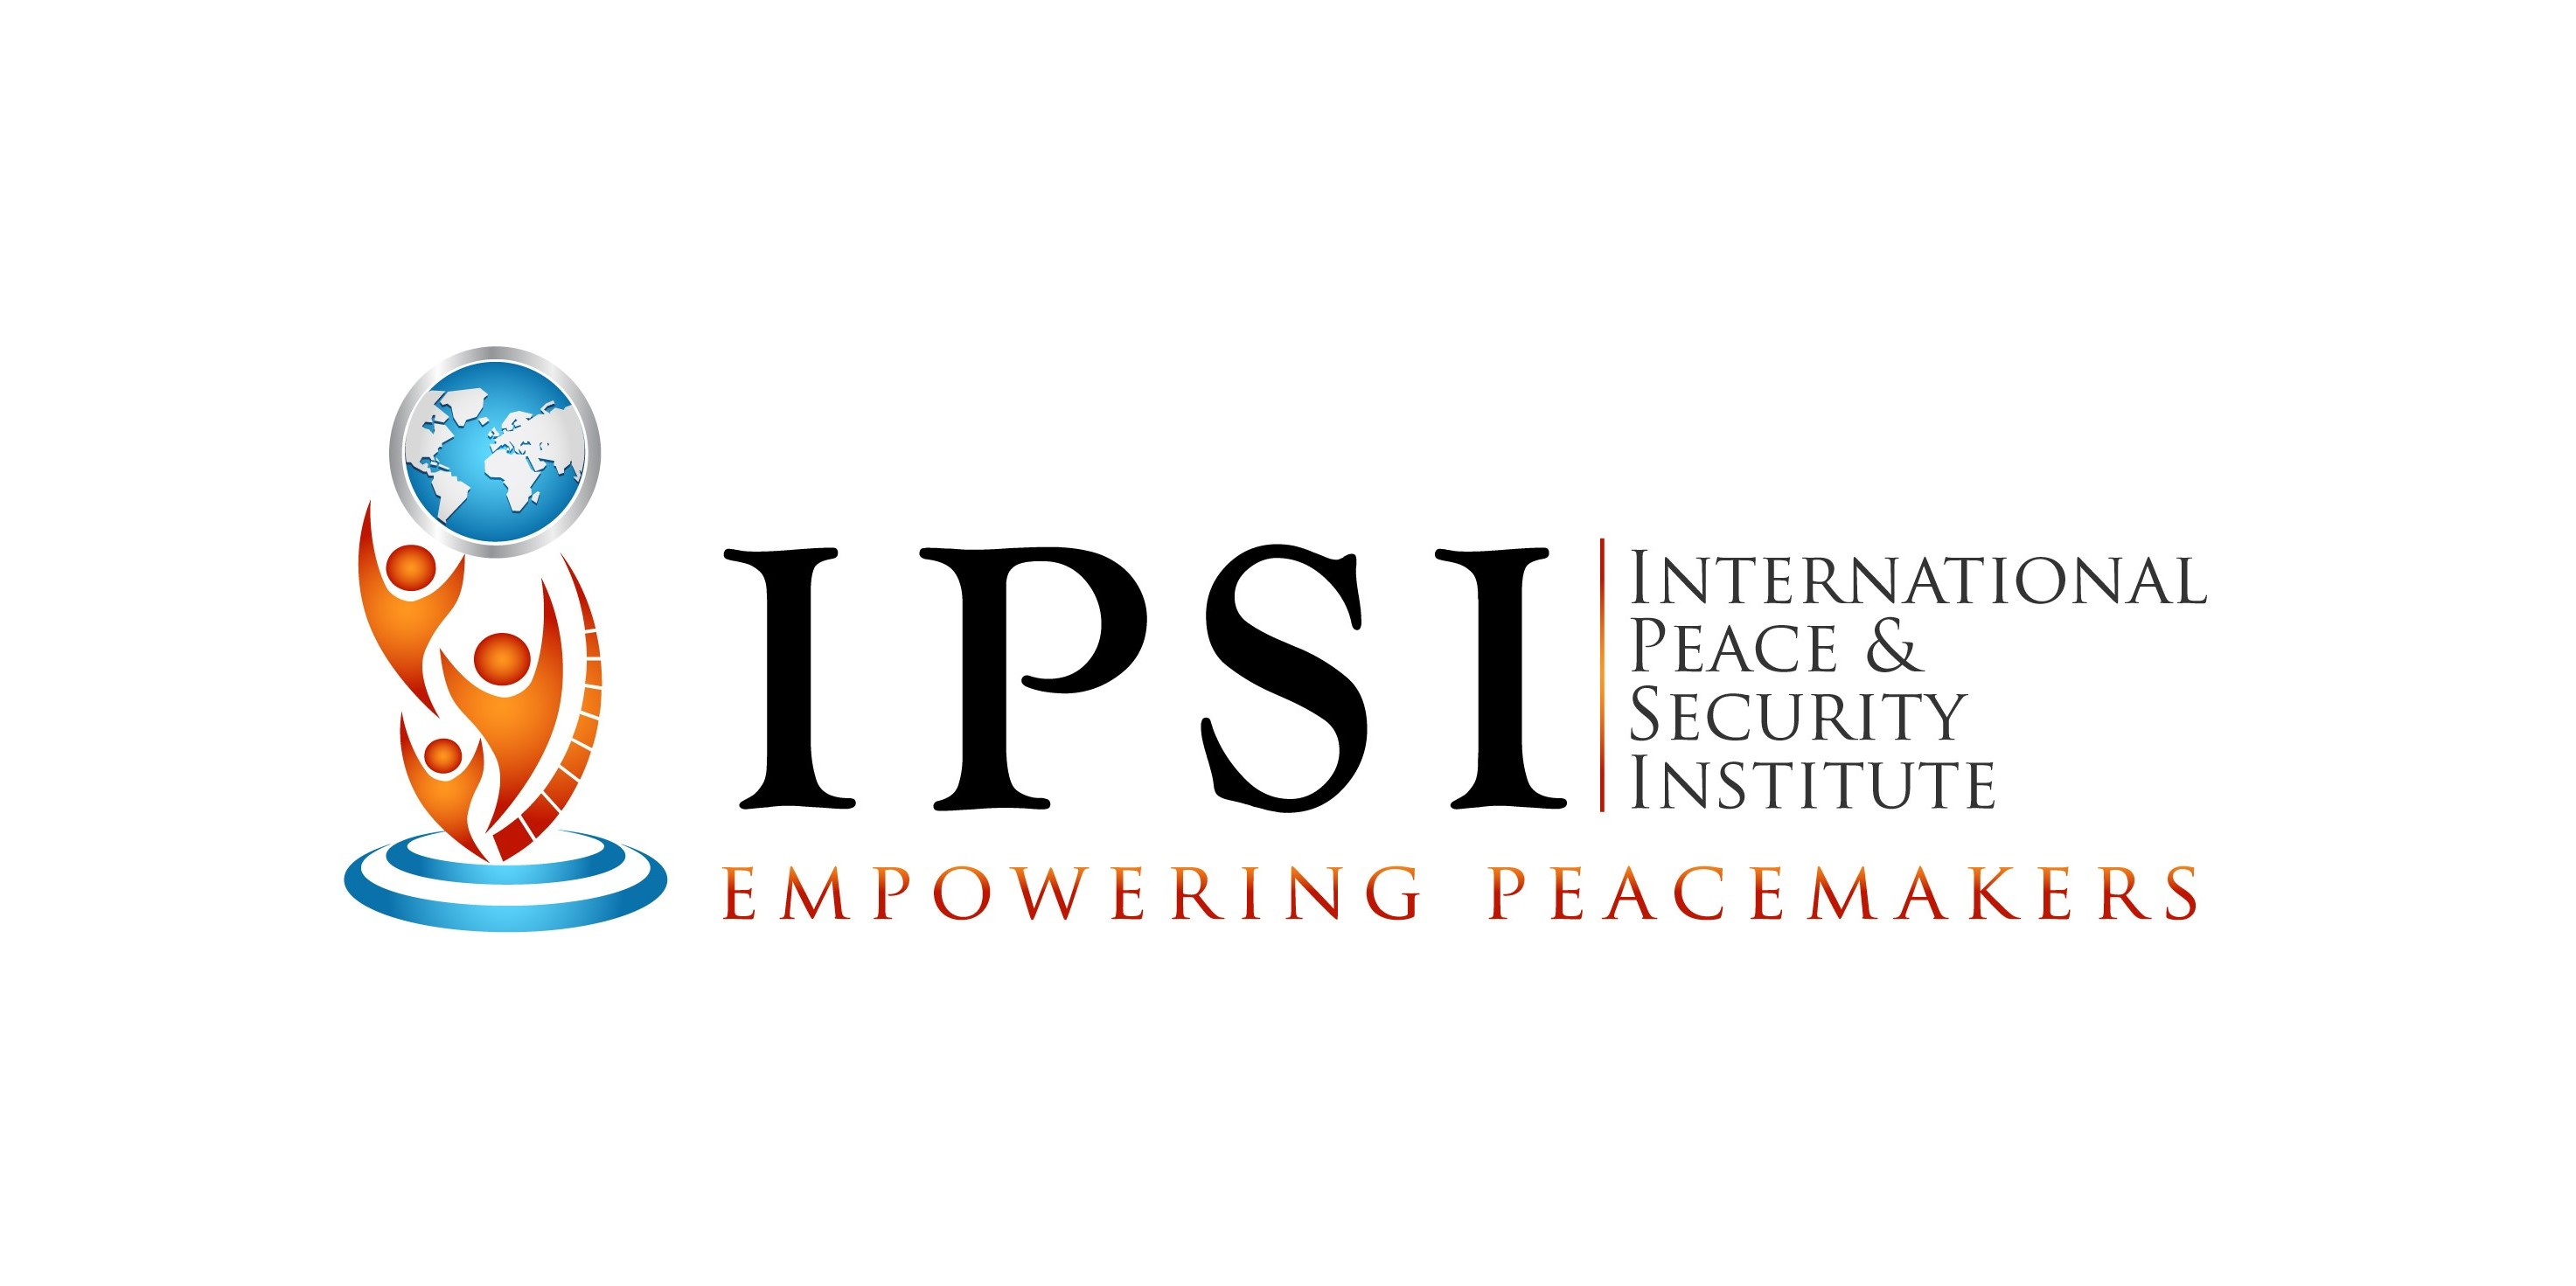 John Hopkins School of International Studies Summer Symposium on Conflict Prevention, Resolution and Negotiation